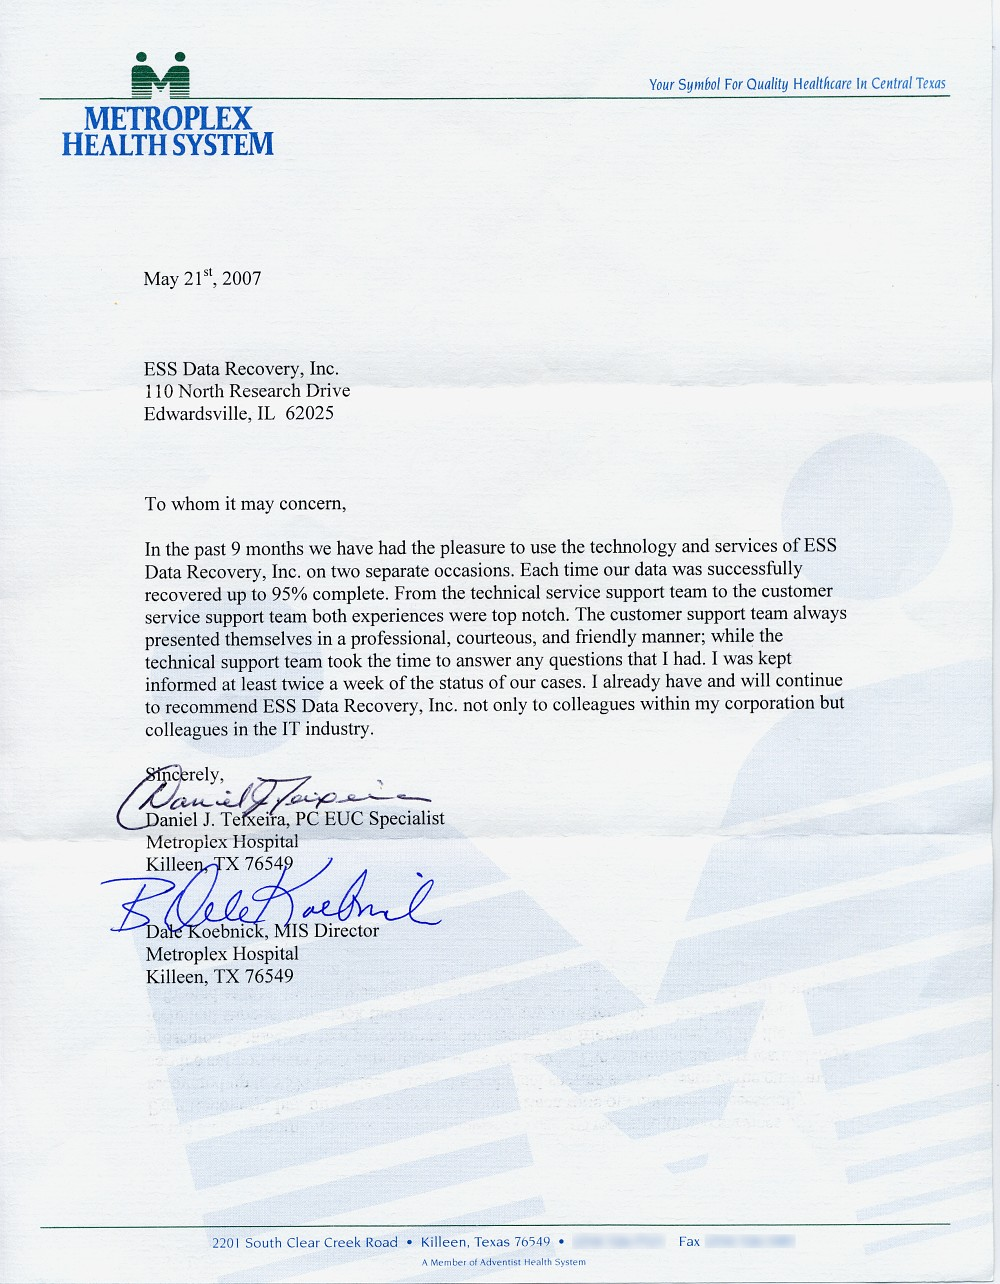 Metroplex Health System testimonial